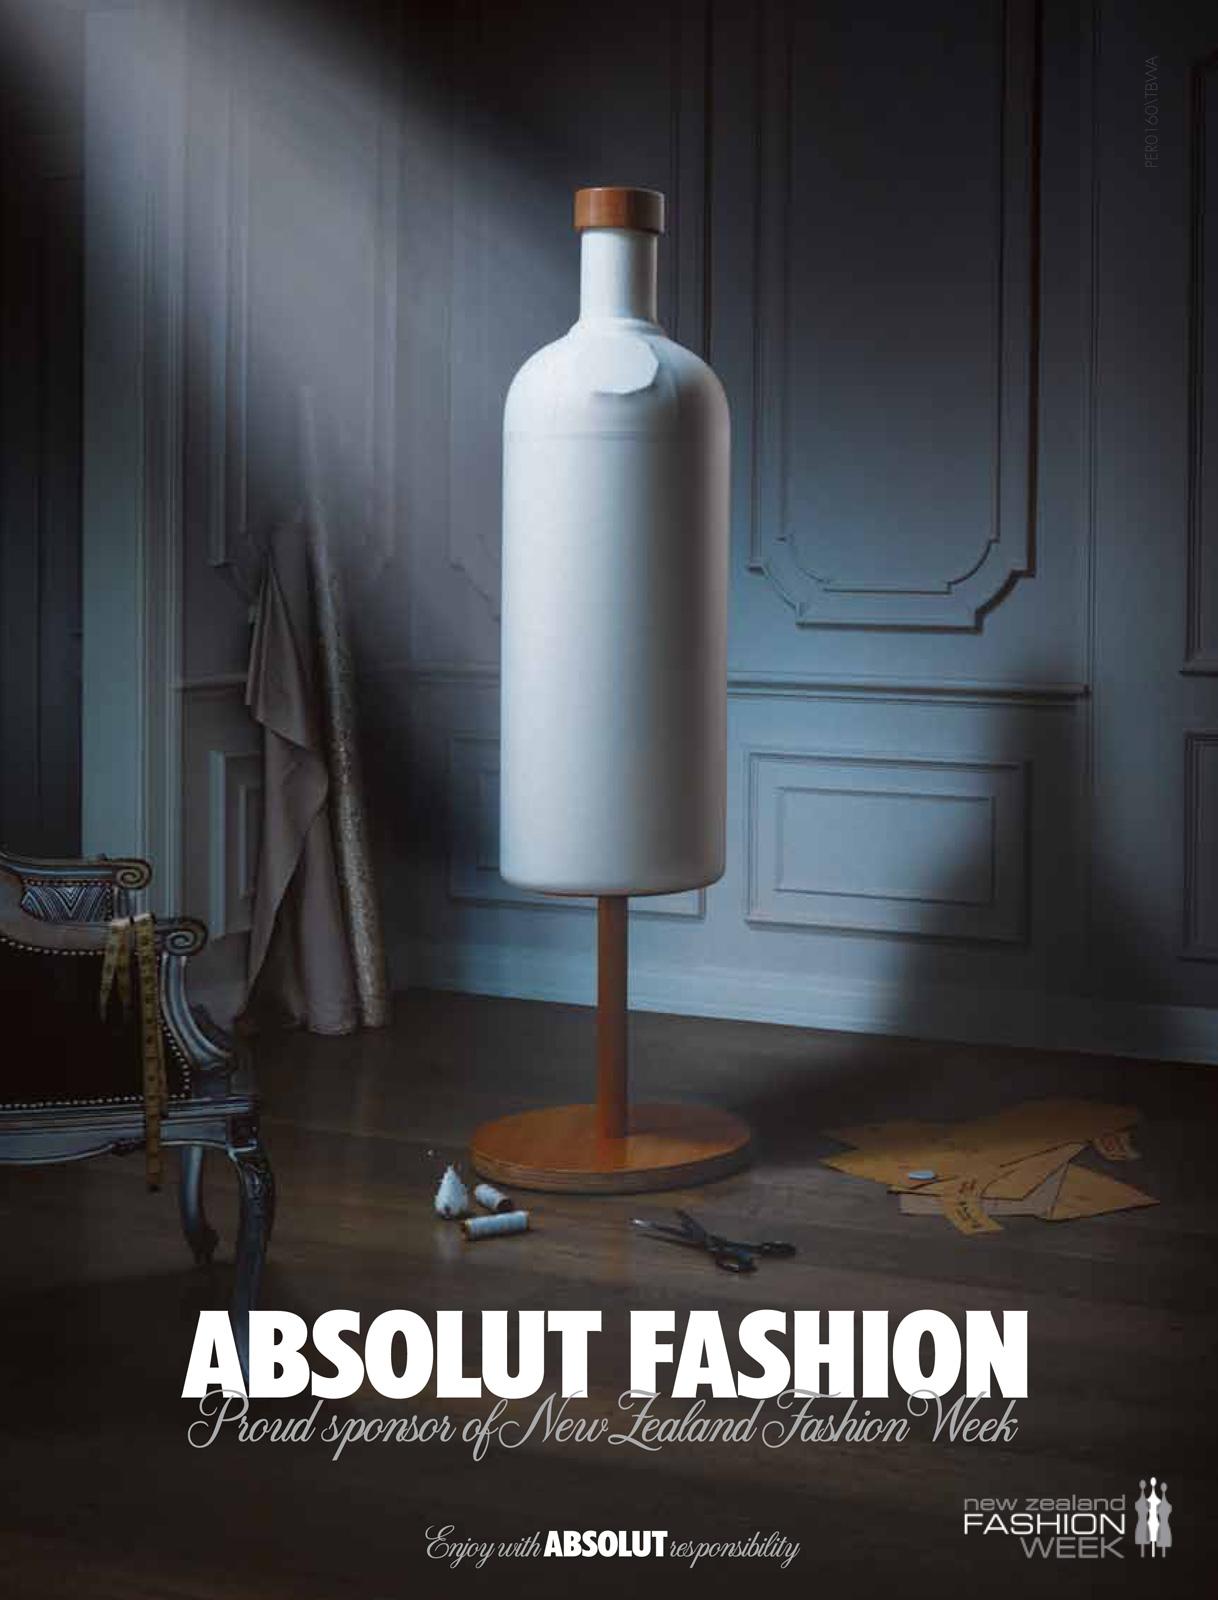 absolut fashion week